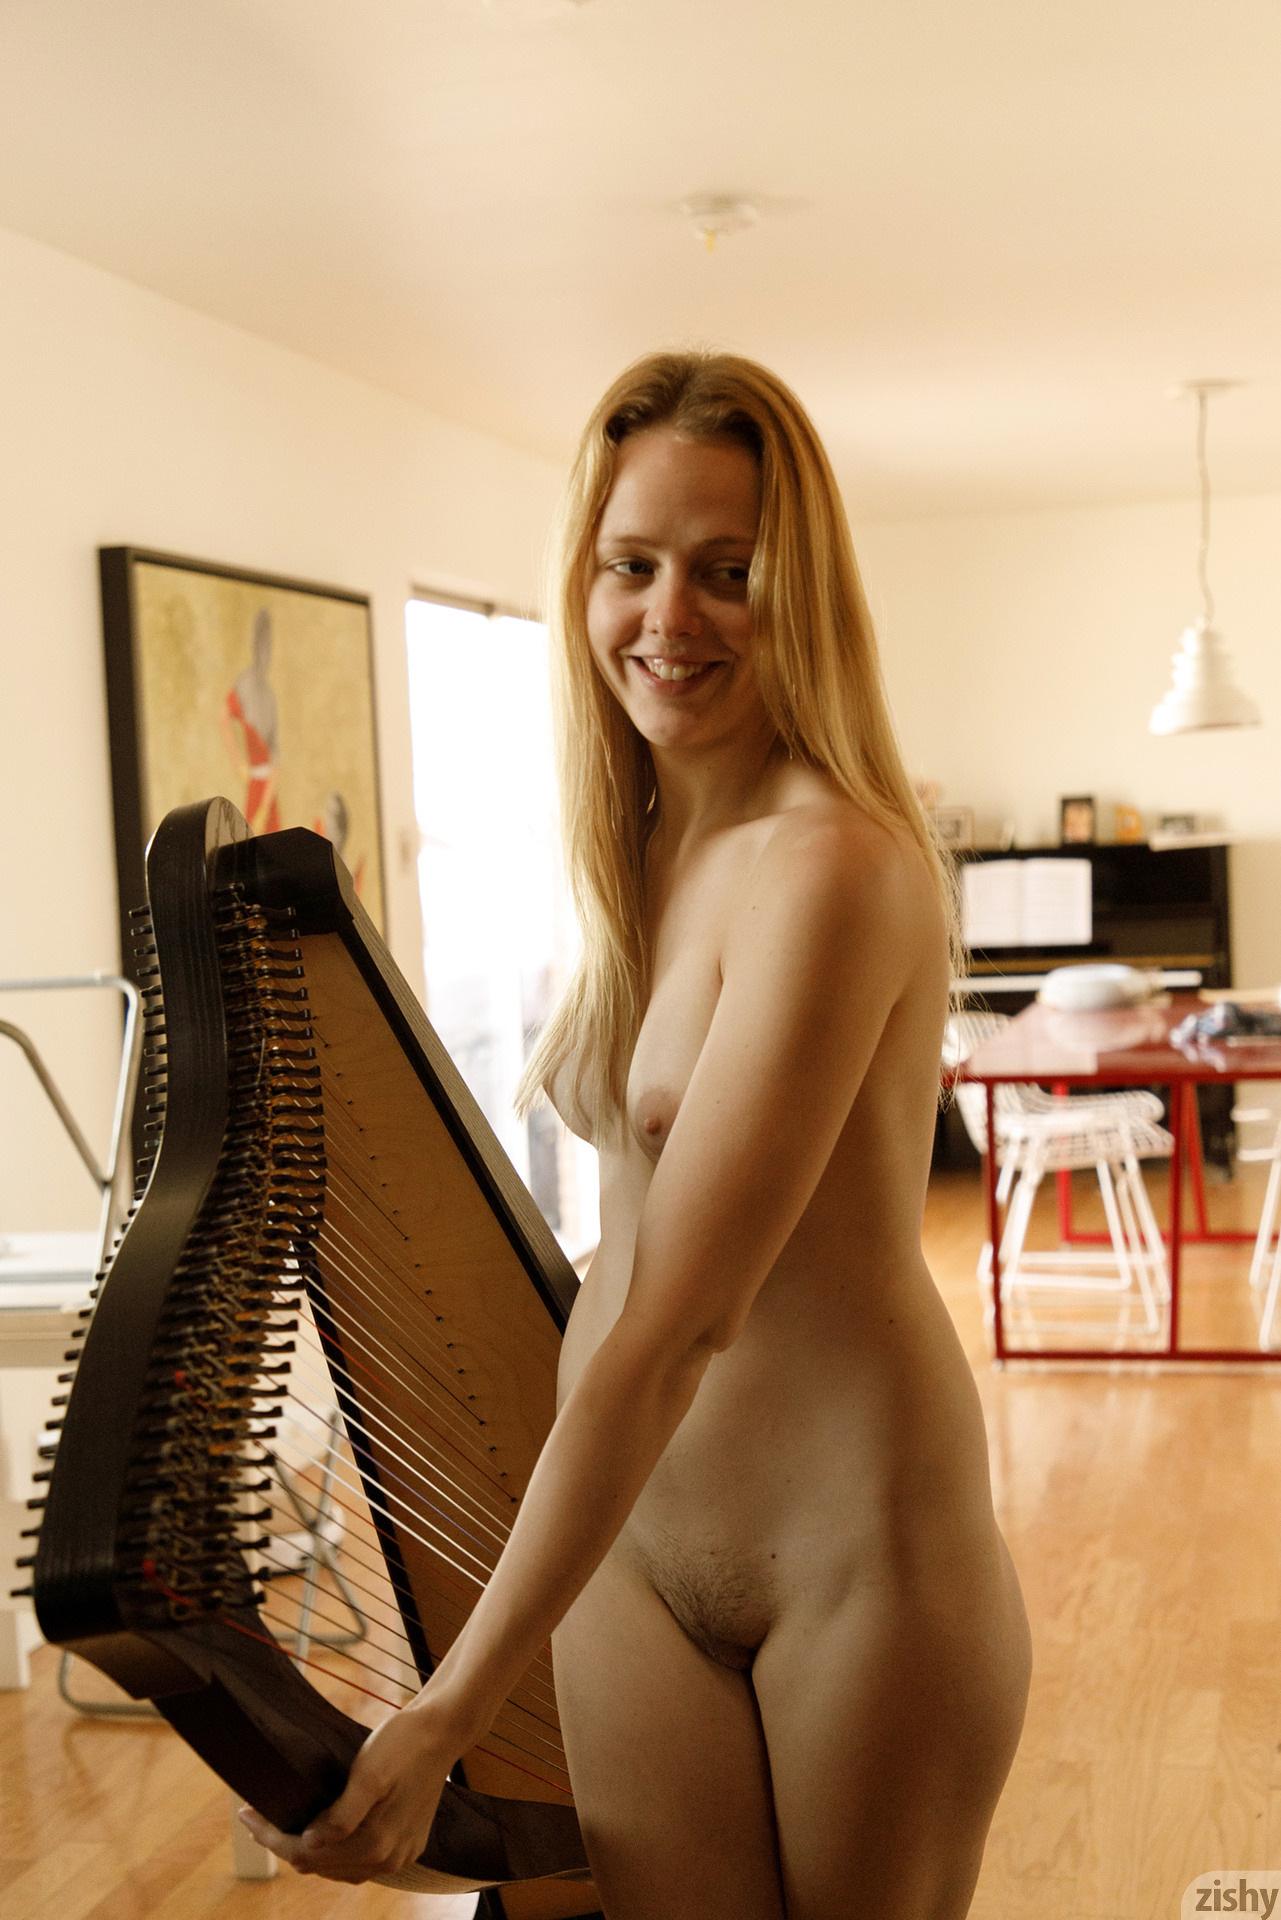 Helen Bergstrom Show Me Your Strings Zishy (35)